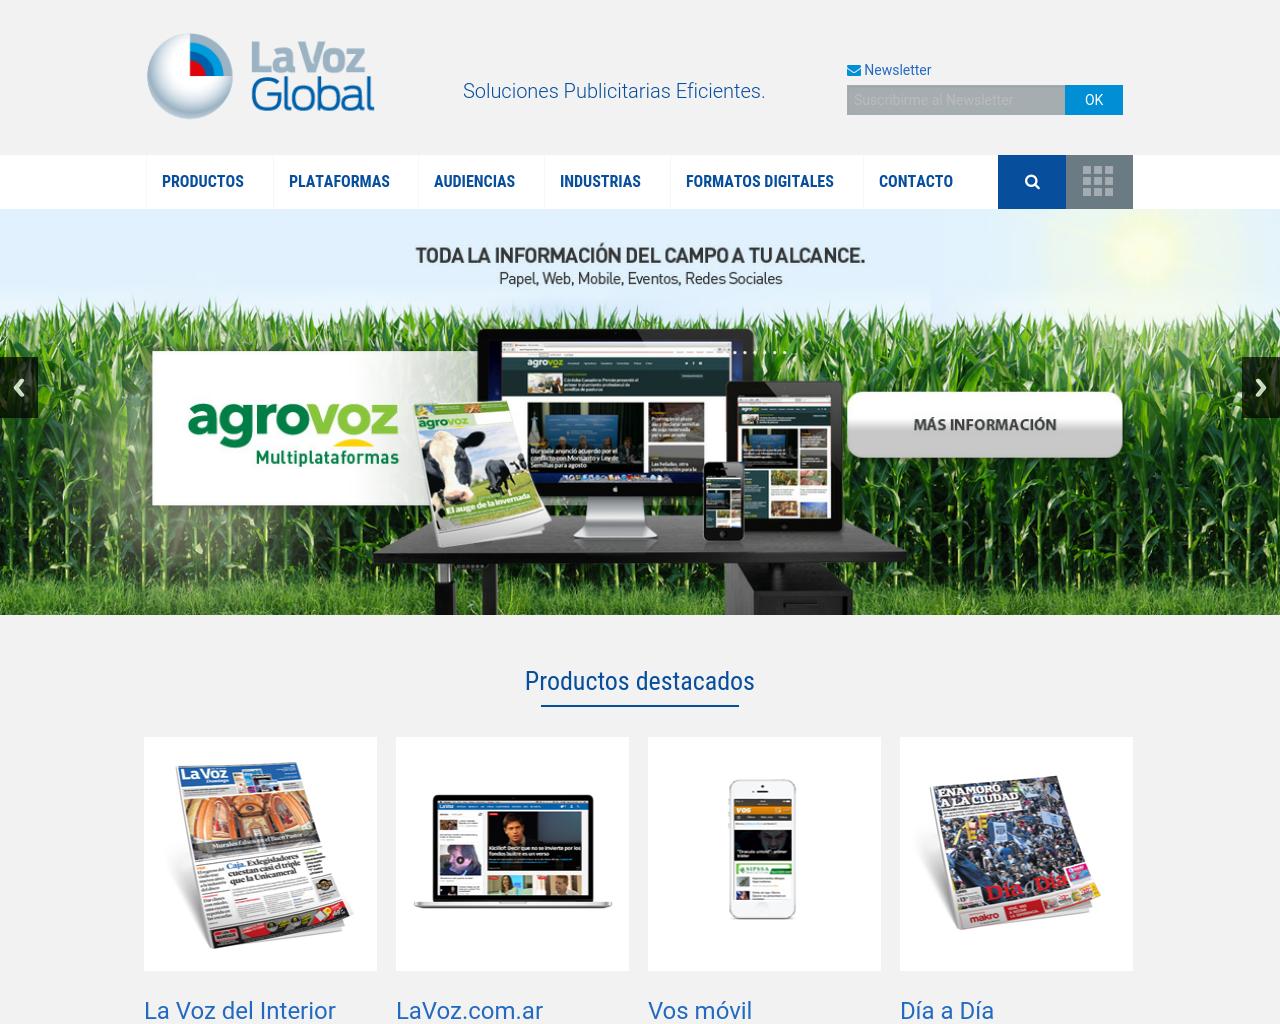 La-Voz-Global-Advertising-Reviews-Pricing